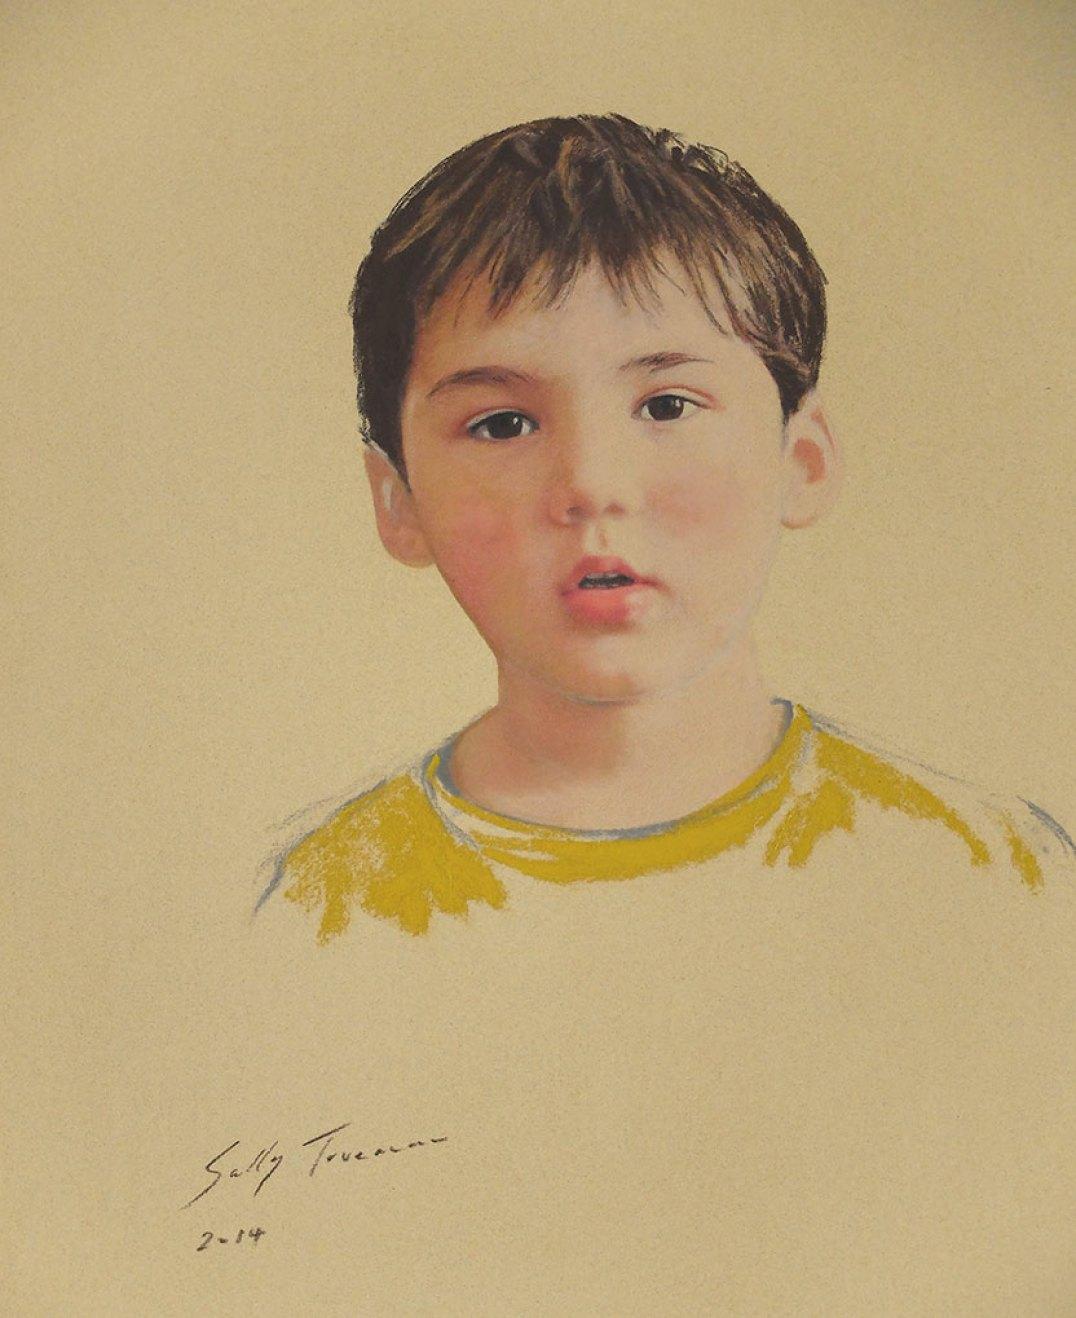 Sally-Trueman-Boy-in-Yellow-pastel